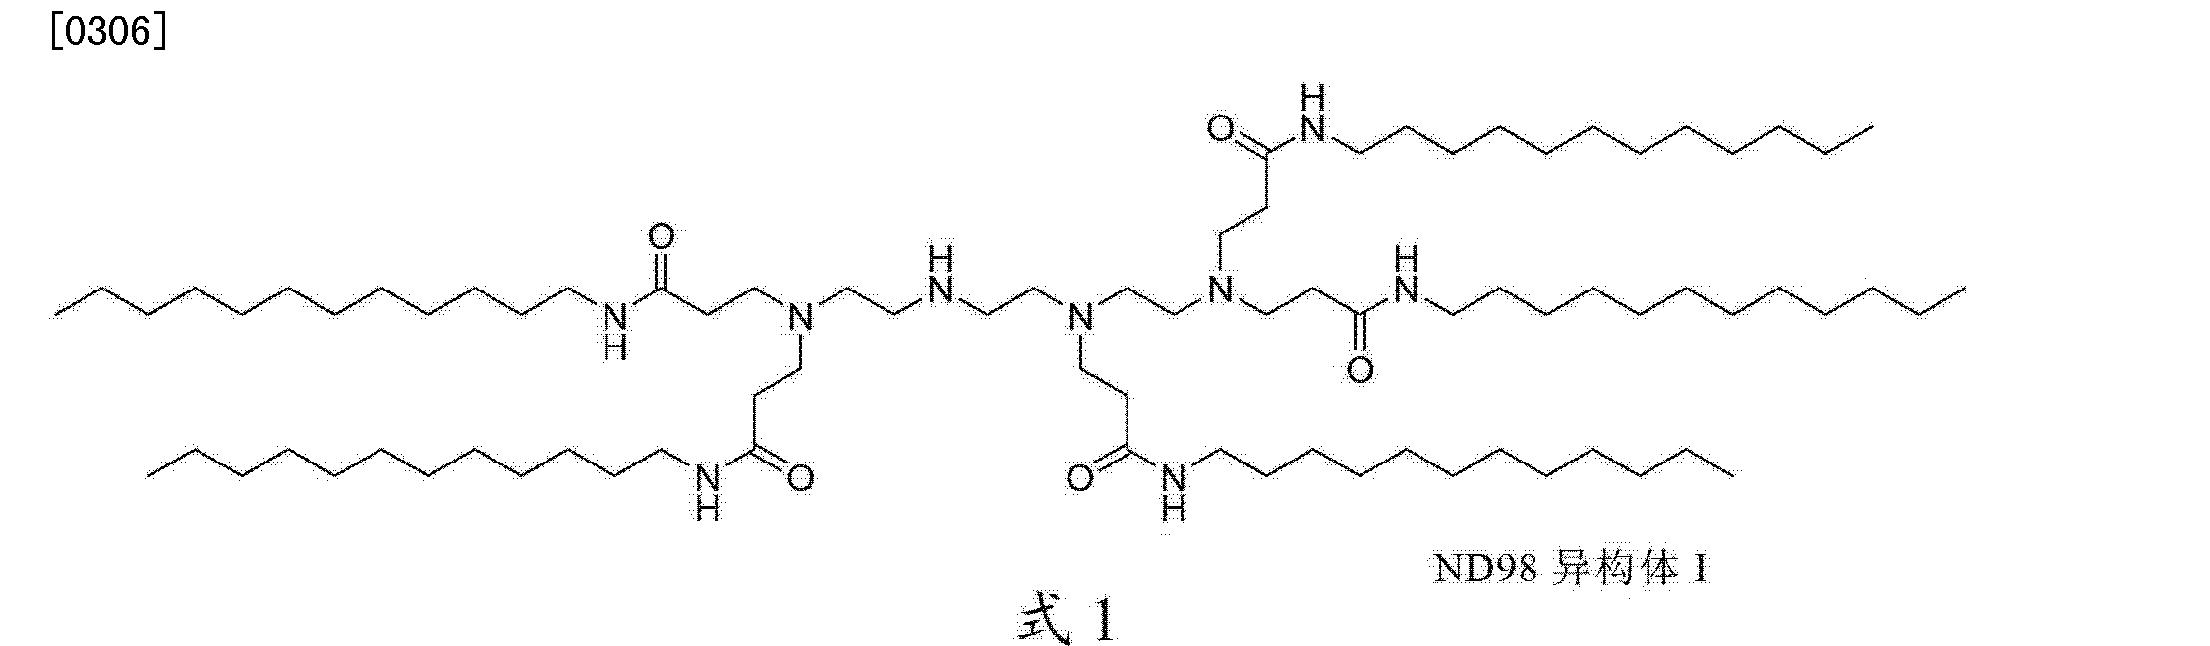 Figure CN104922699AD00441